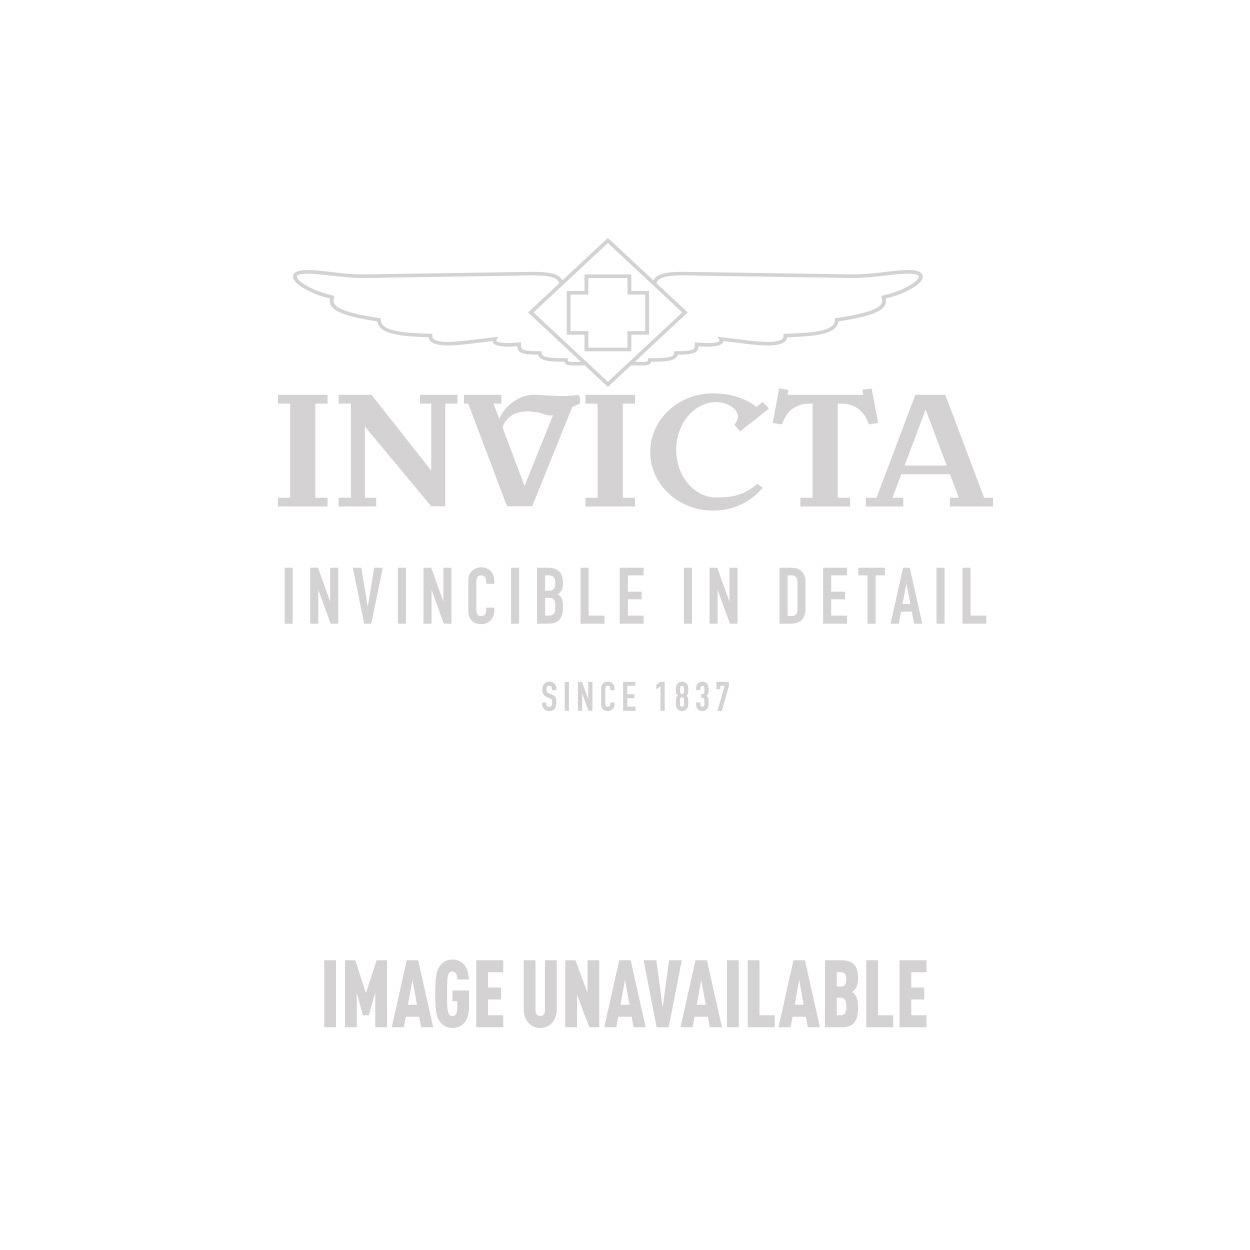 Men Watches - Invicta Venom Quartz Watch - Model 0359 - Invicta Stores